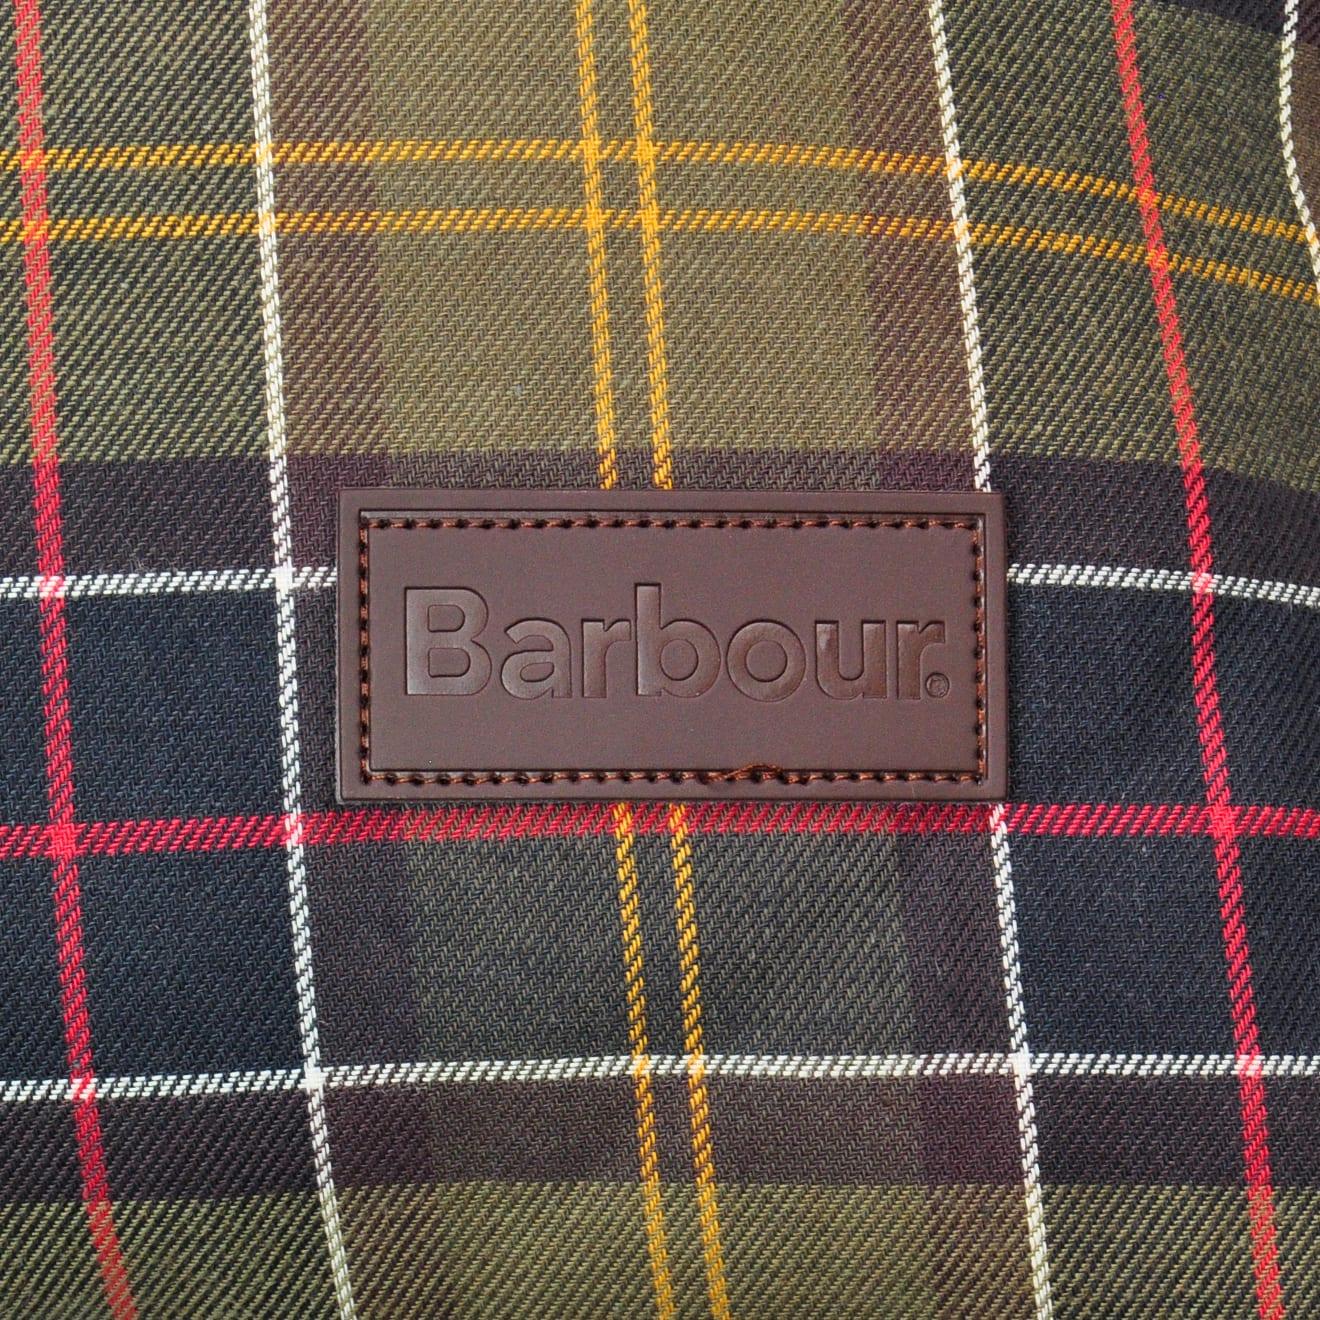 Barbour wax cotton dog bed duvet classic tartan